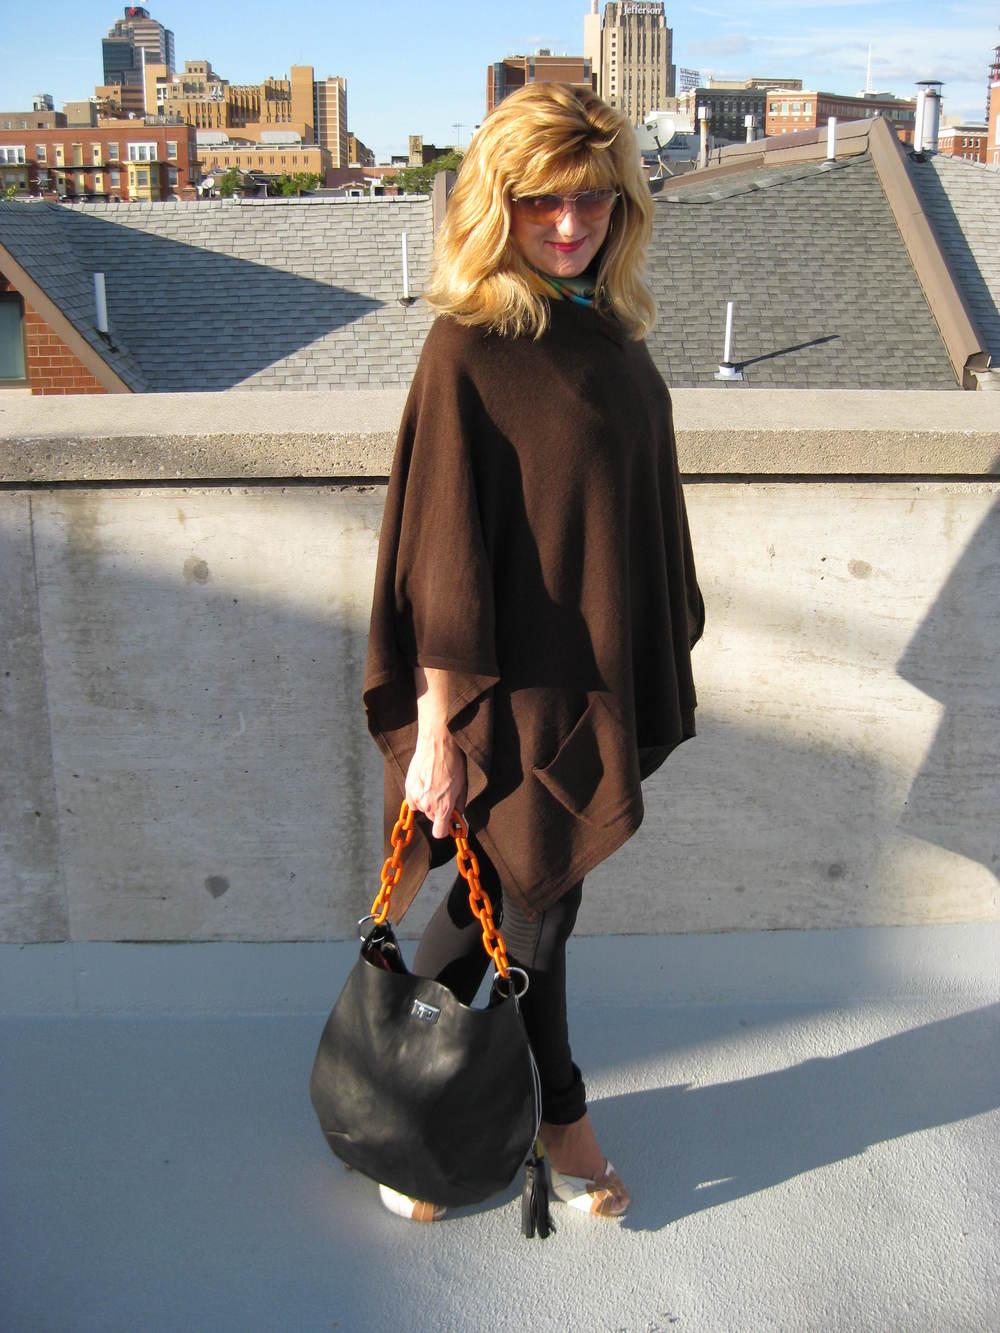 doreen creede brand ambassador cbc rooftop